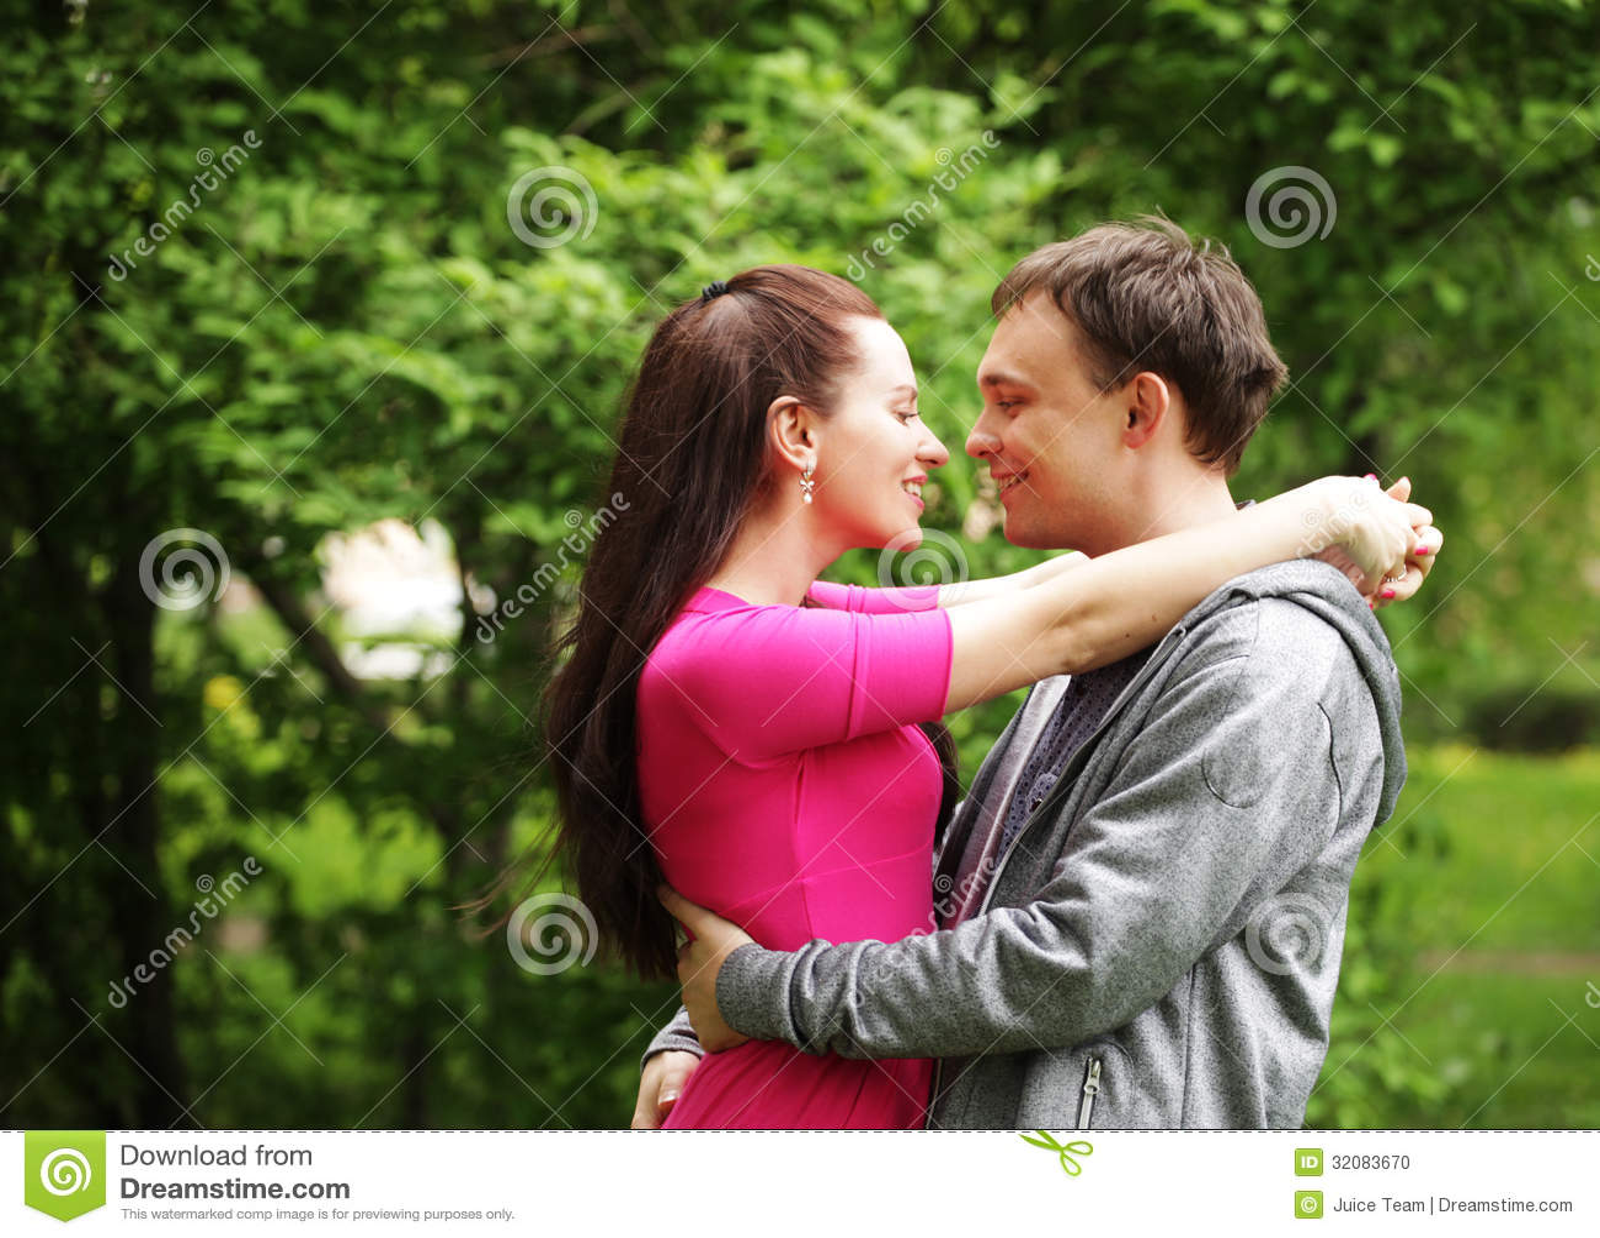 Young beautiful couple in a sweet cheek kiss